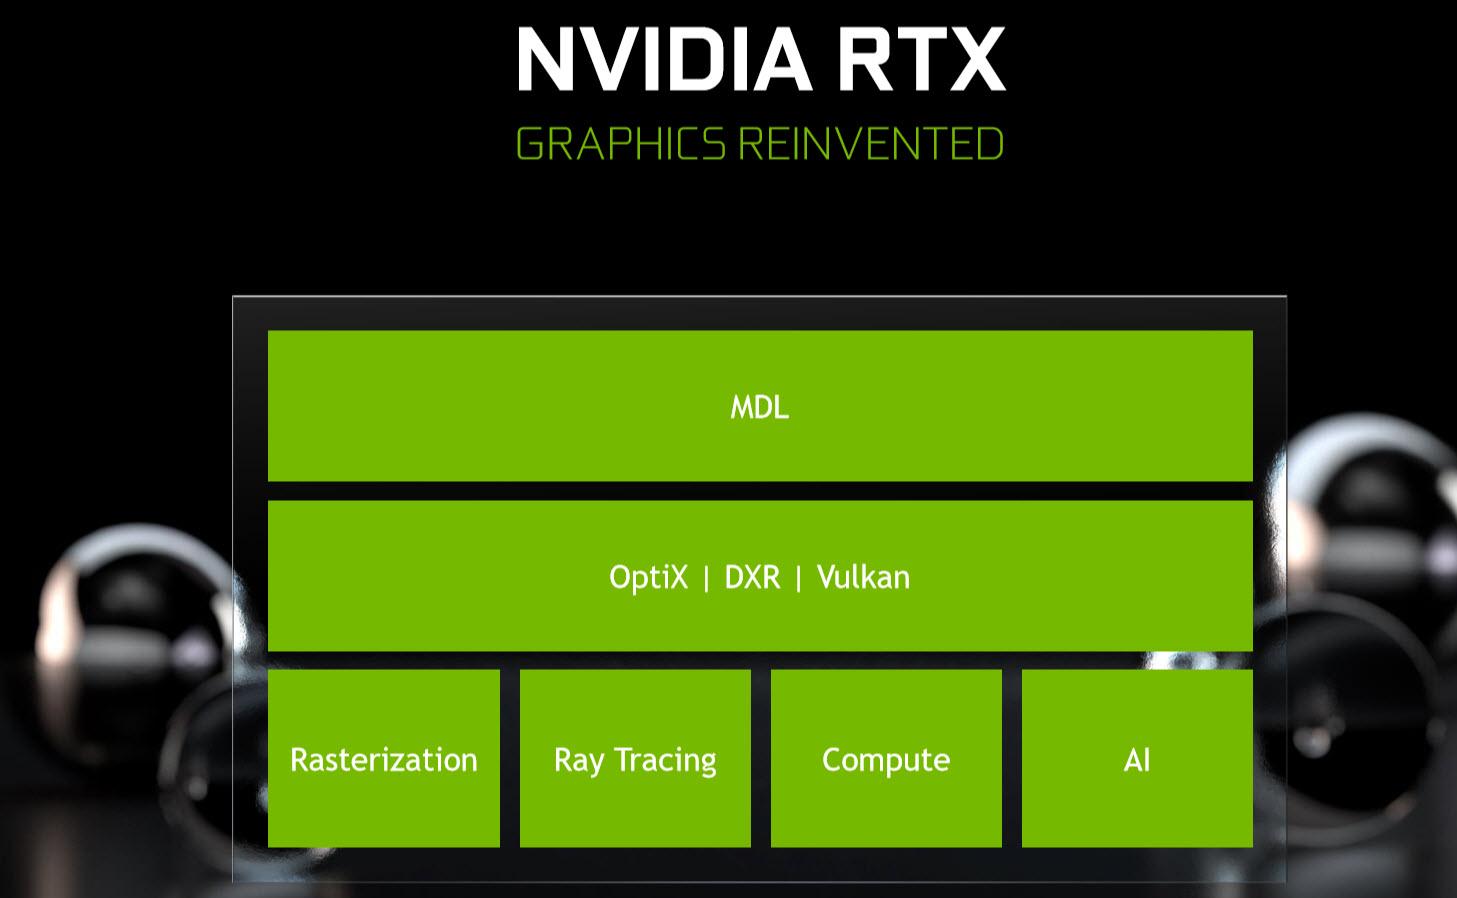 2018 08 21 9 29 05 NVIDIA เปิดตัวการ์ดจอ GeForce RTX 2080 Ti, RTX 2080 และ RTX 2070 รุ่นใหม่ล่าสุดอย่างเป็นทางการ